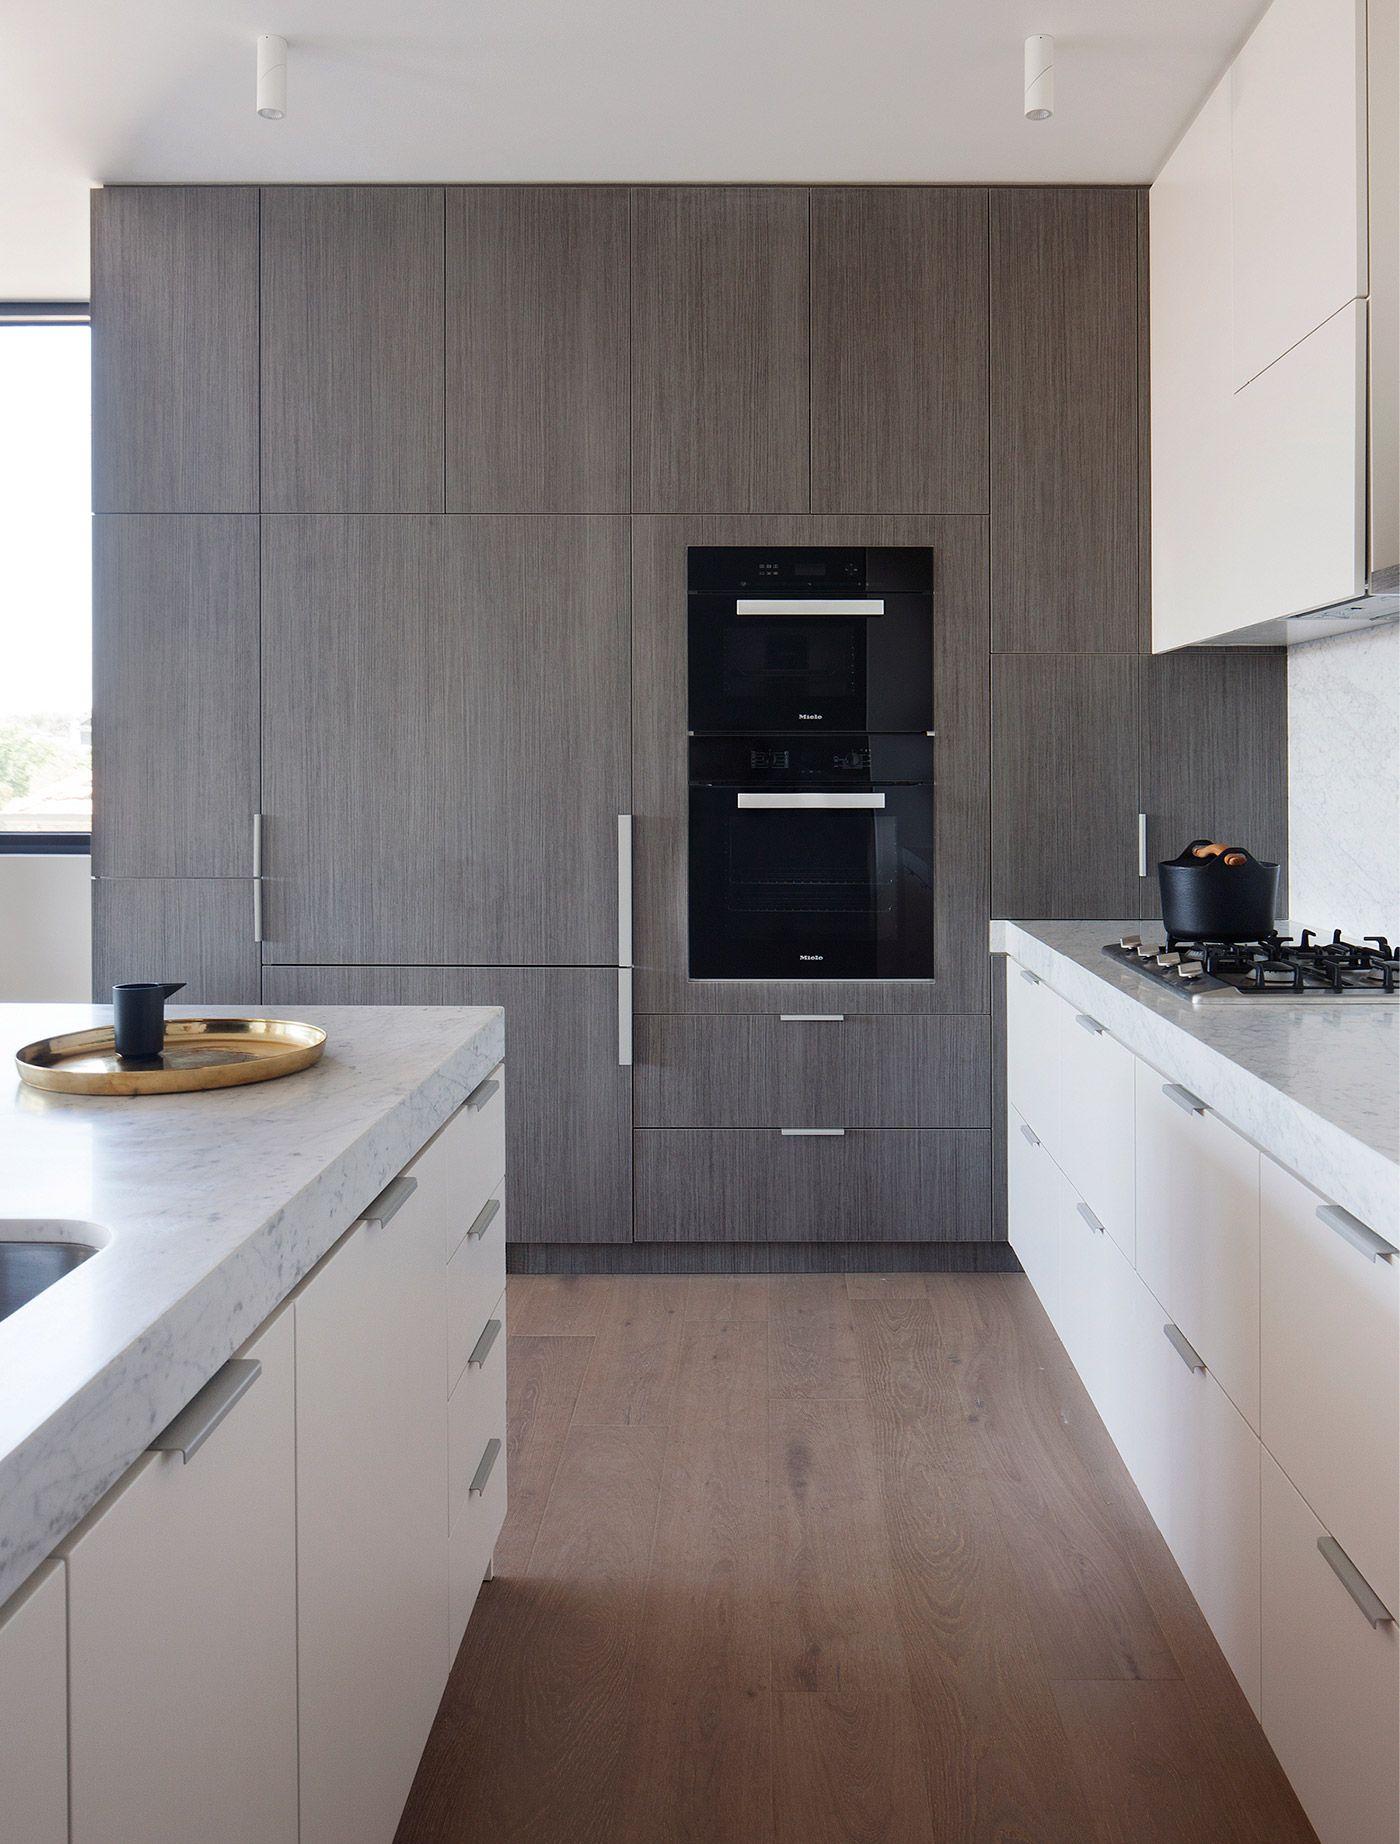 2 kücheninsel-ideen lux u modern townhouse  modern kitchens  pinterest  townhouse